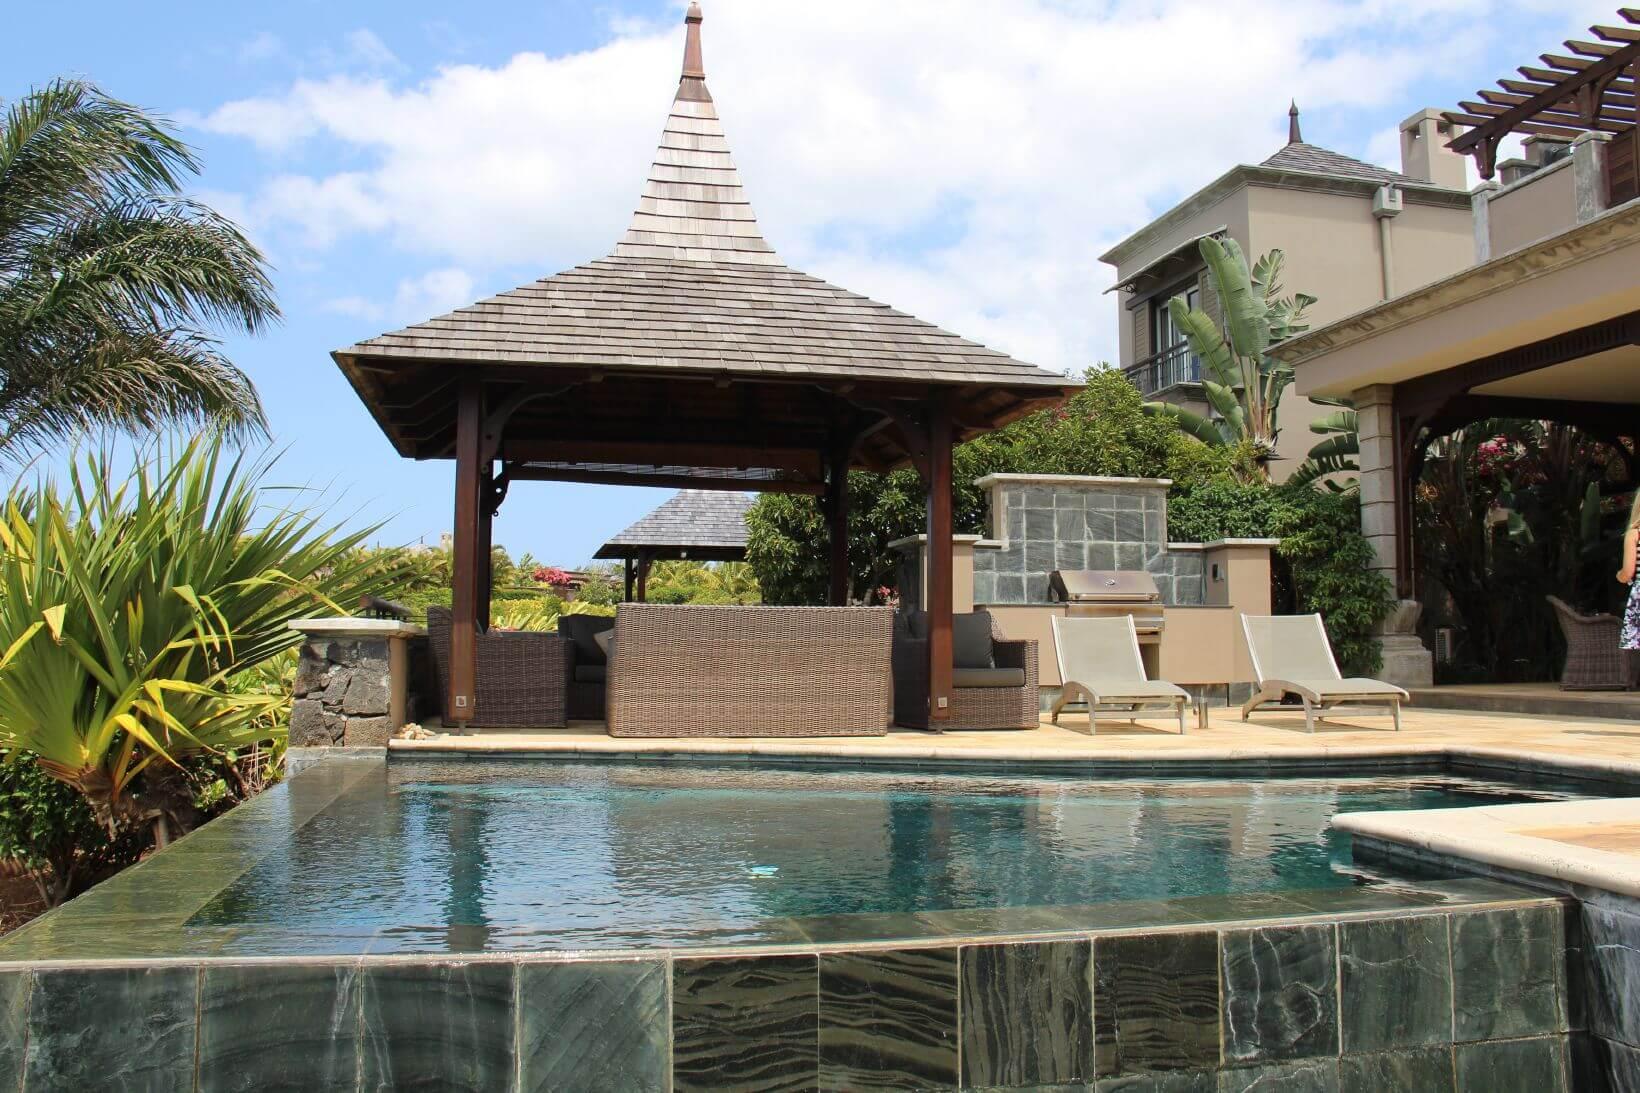 Mauritius - The Heritage Village